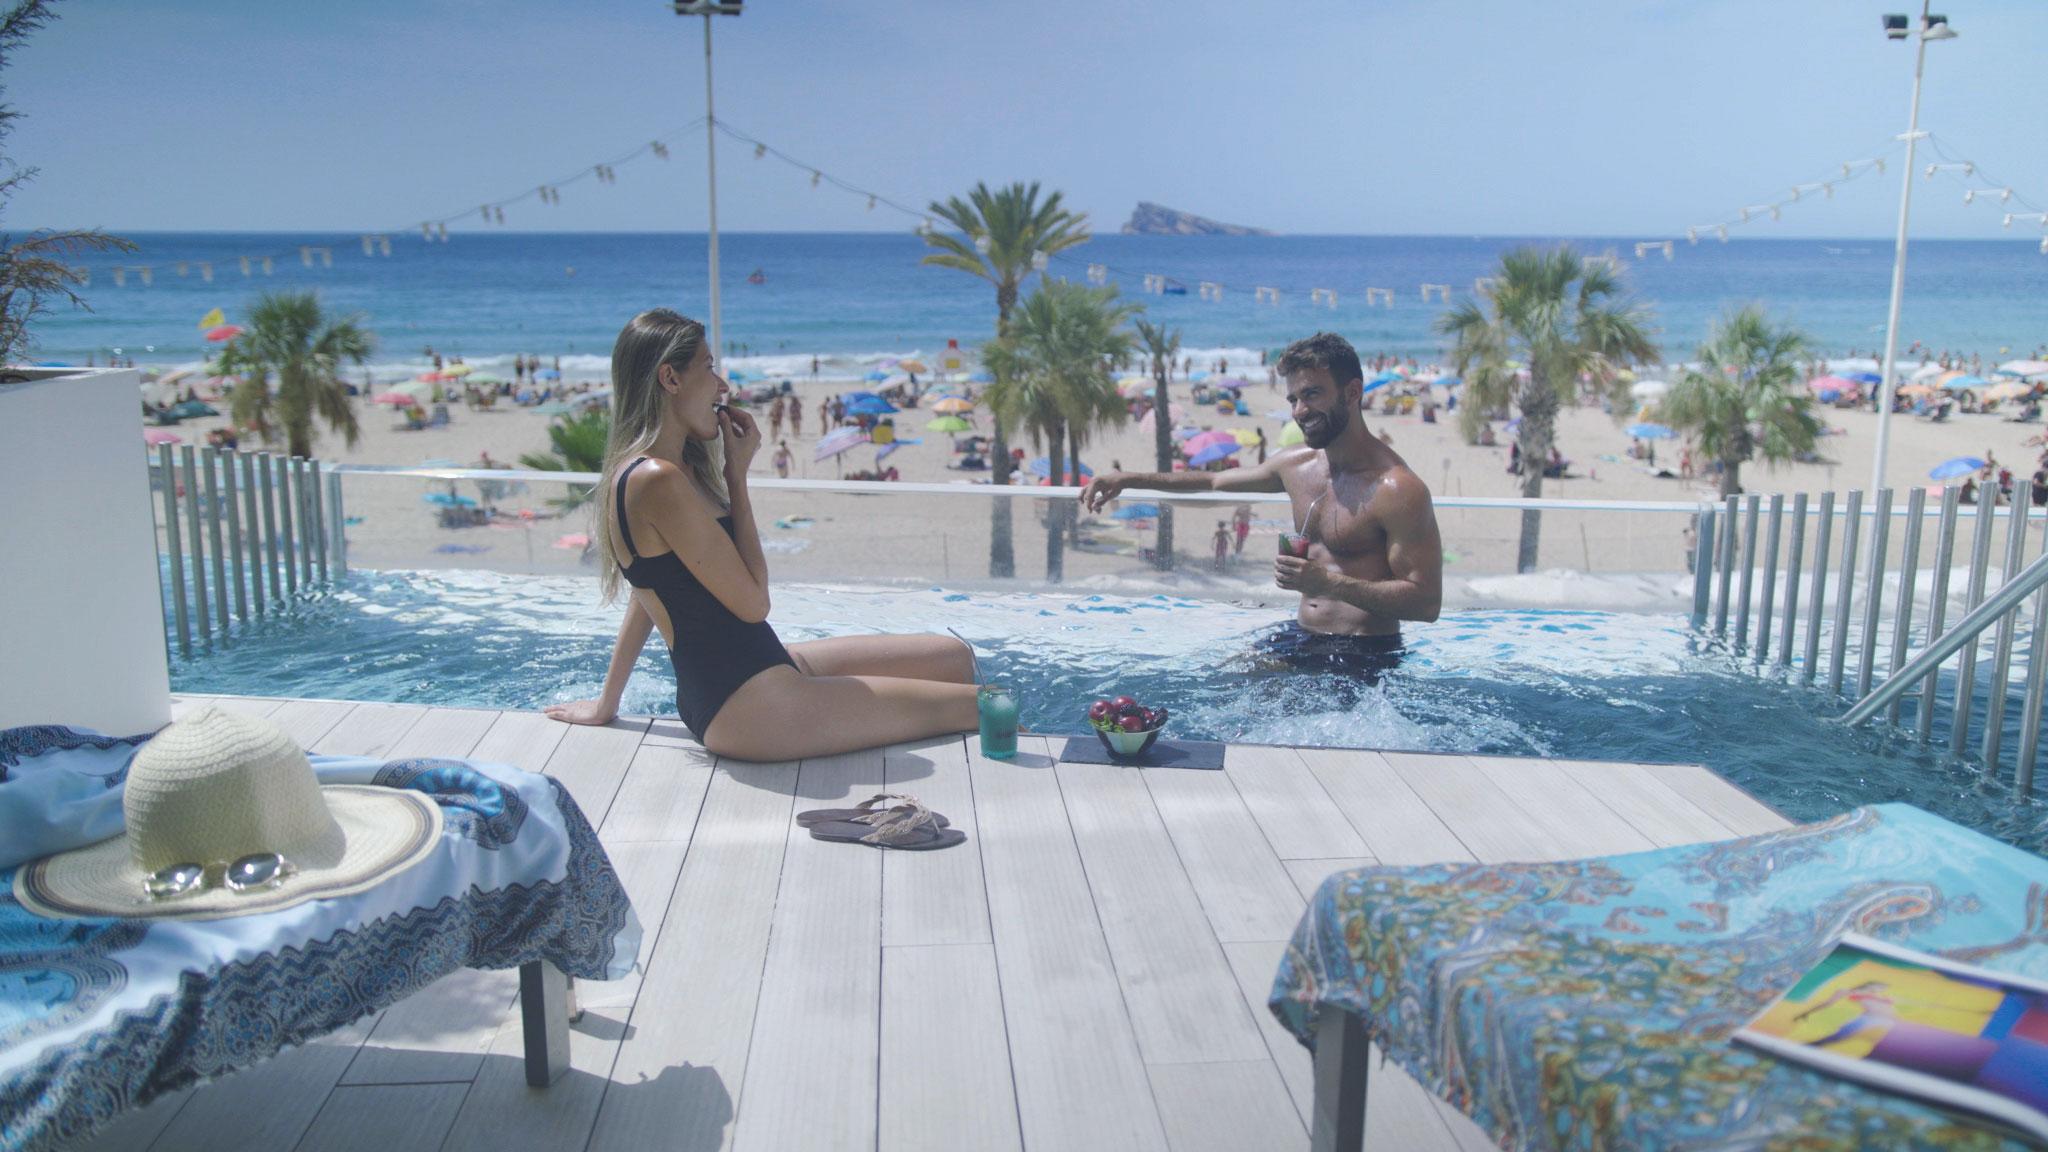 Spot-Hoteles-Benidorm-turismo-videogenic